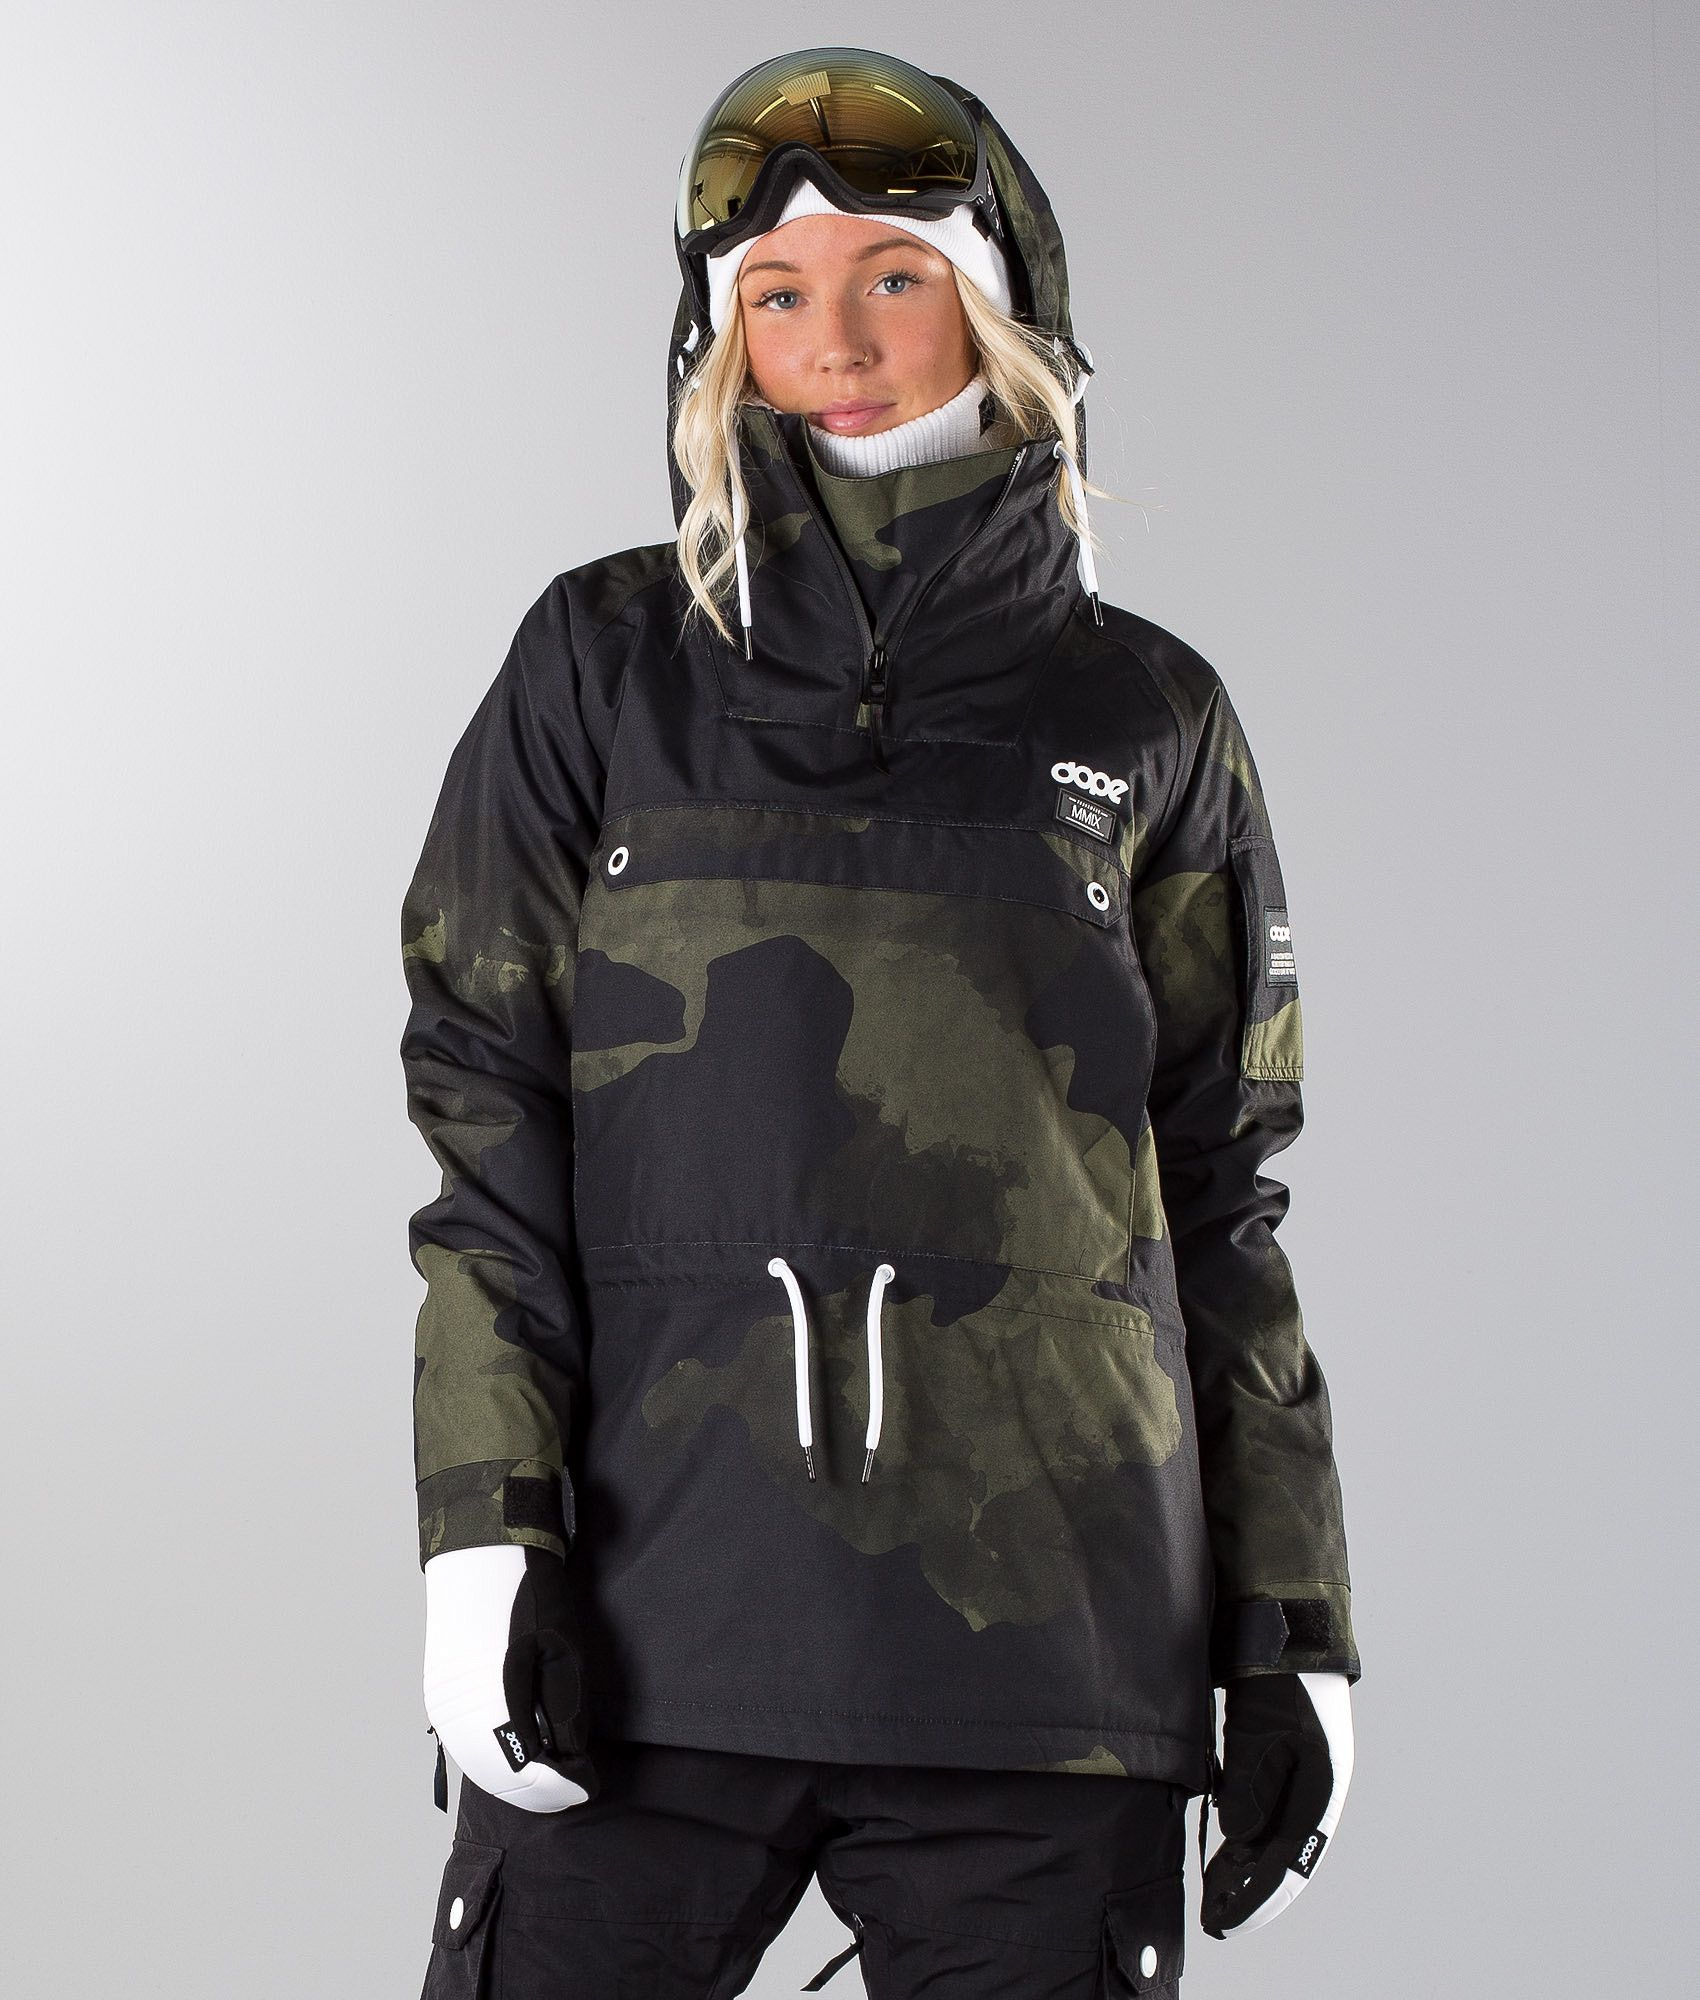 Pin on Snowboarding